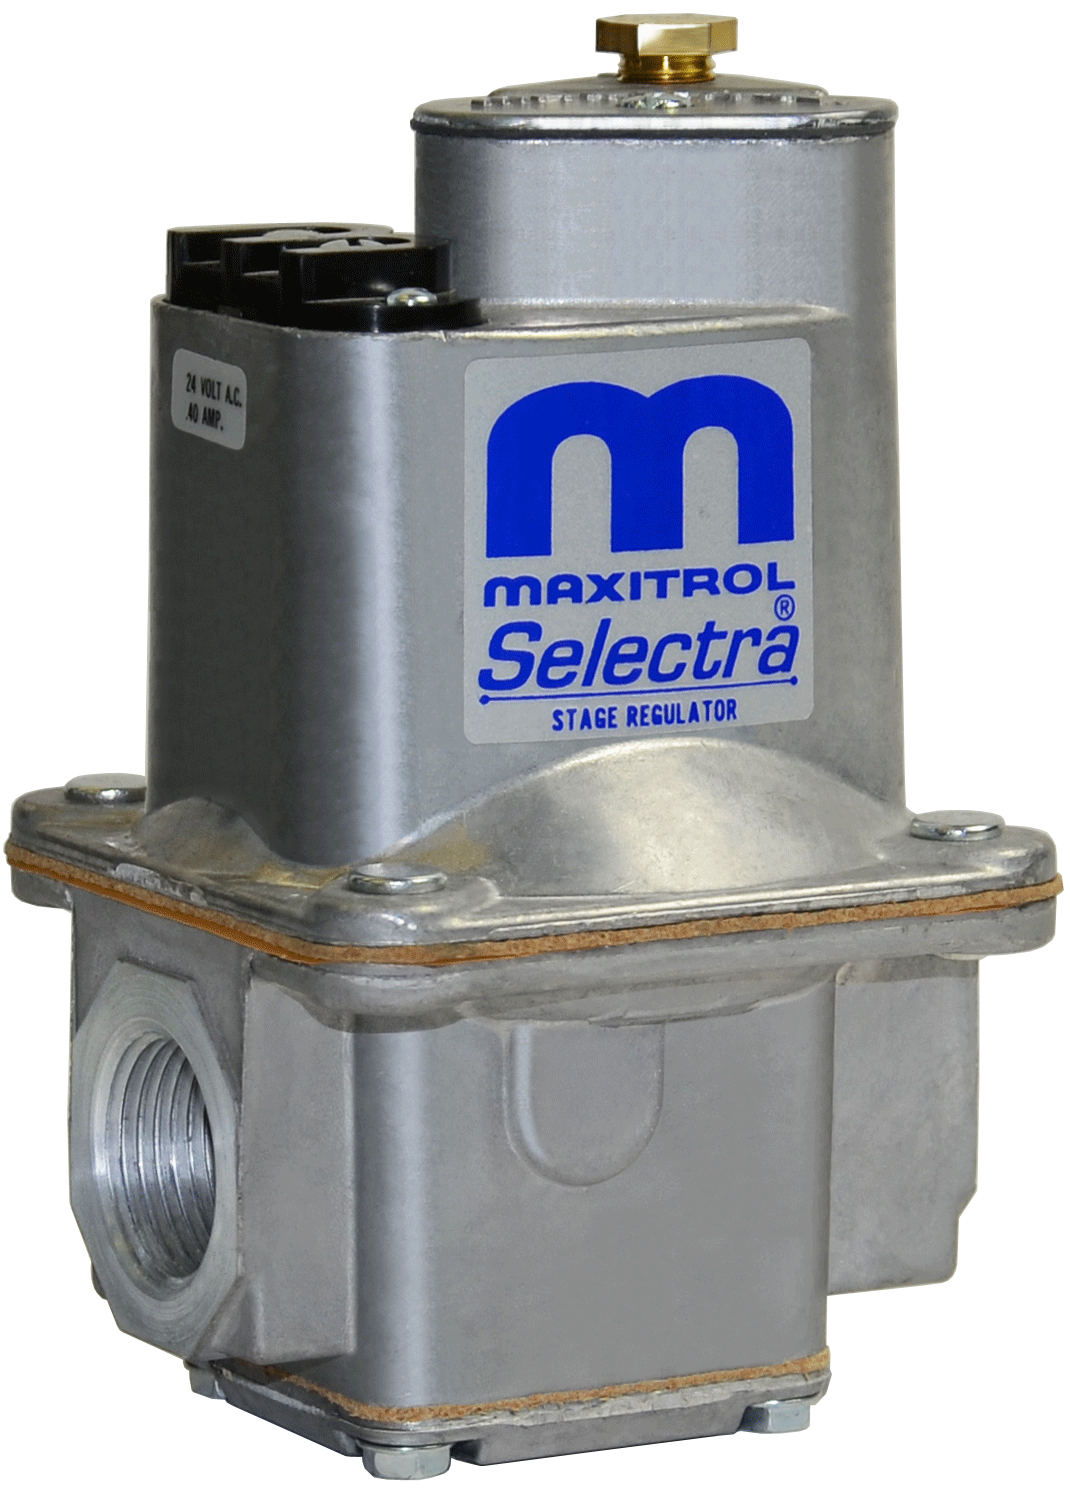 "Maxitrol SR400-1/2 Gas Regulator 2-Stage 1/2"" NPT"